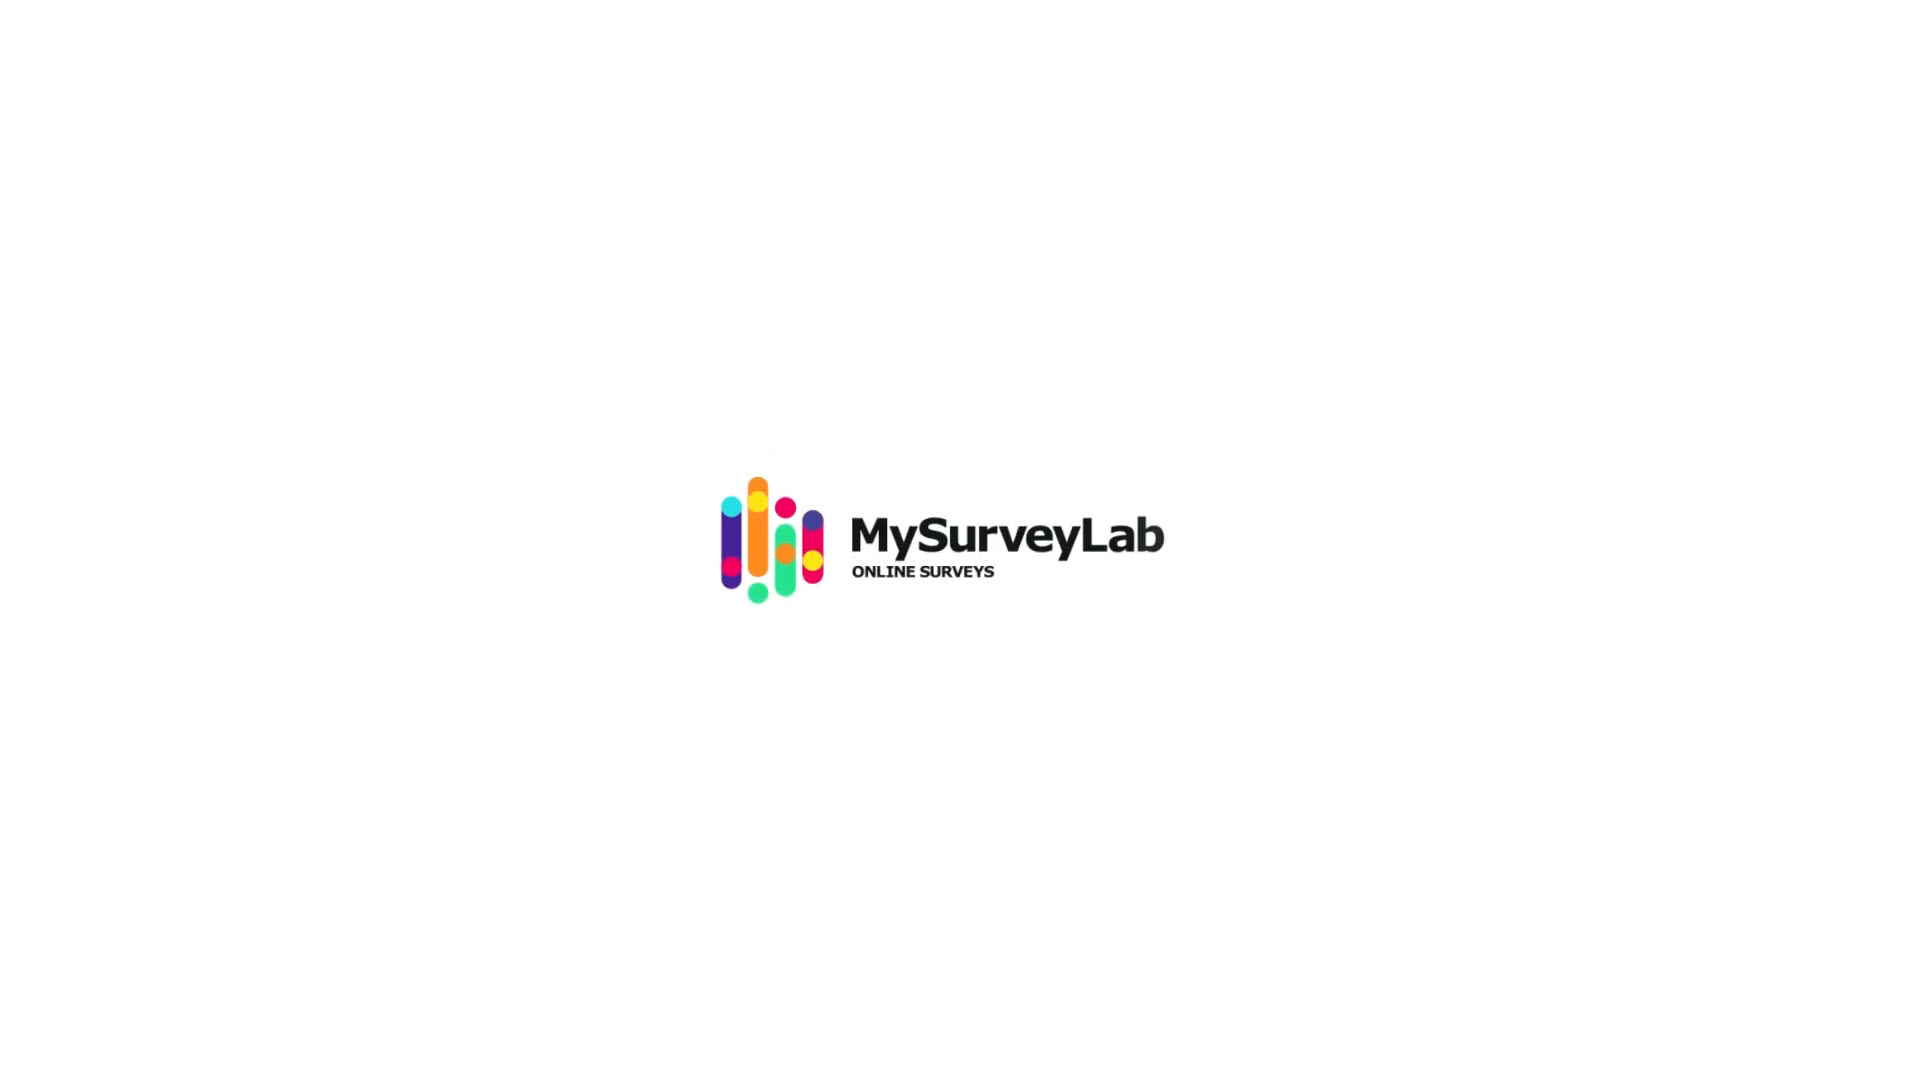 SurveyLab